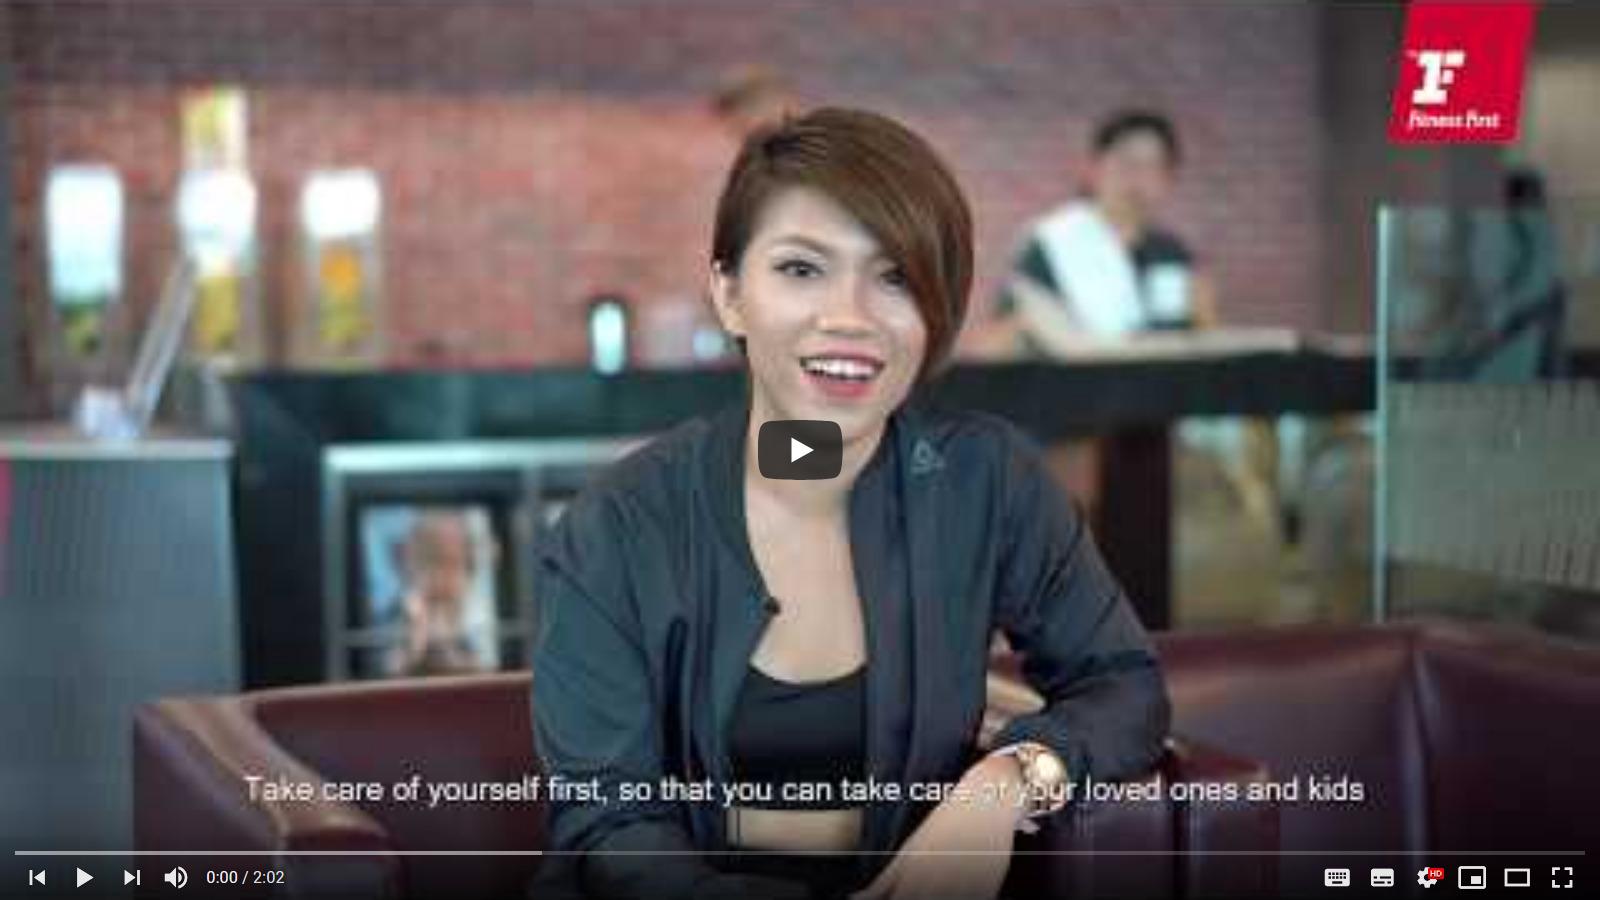 New You Achievement Awards 2019 | Ai Yiing Lim